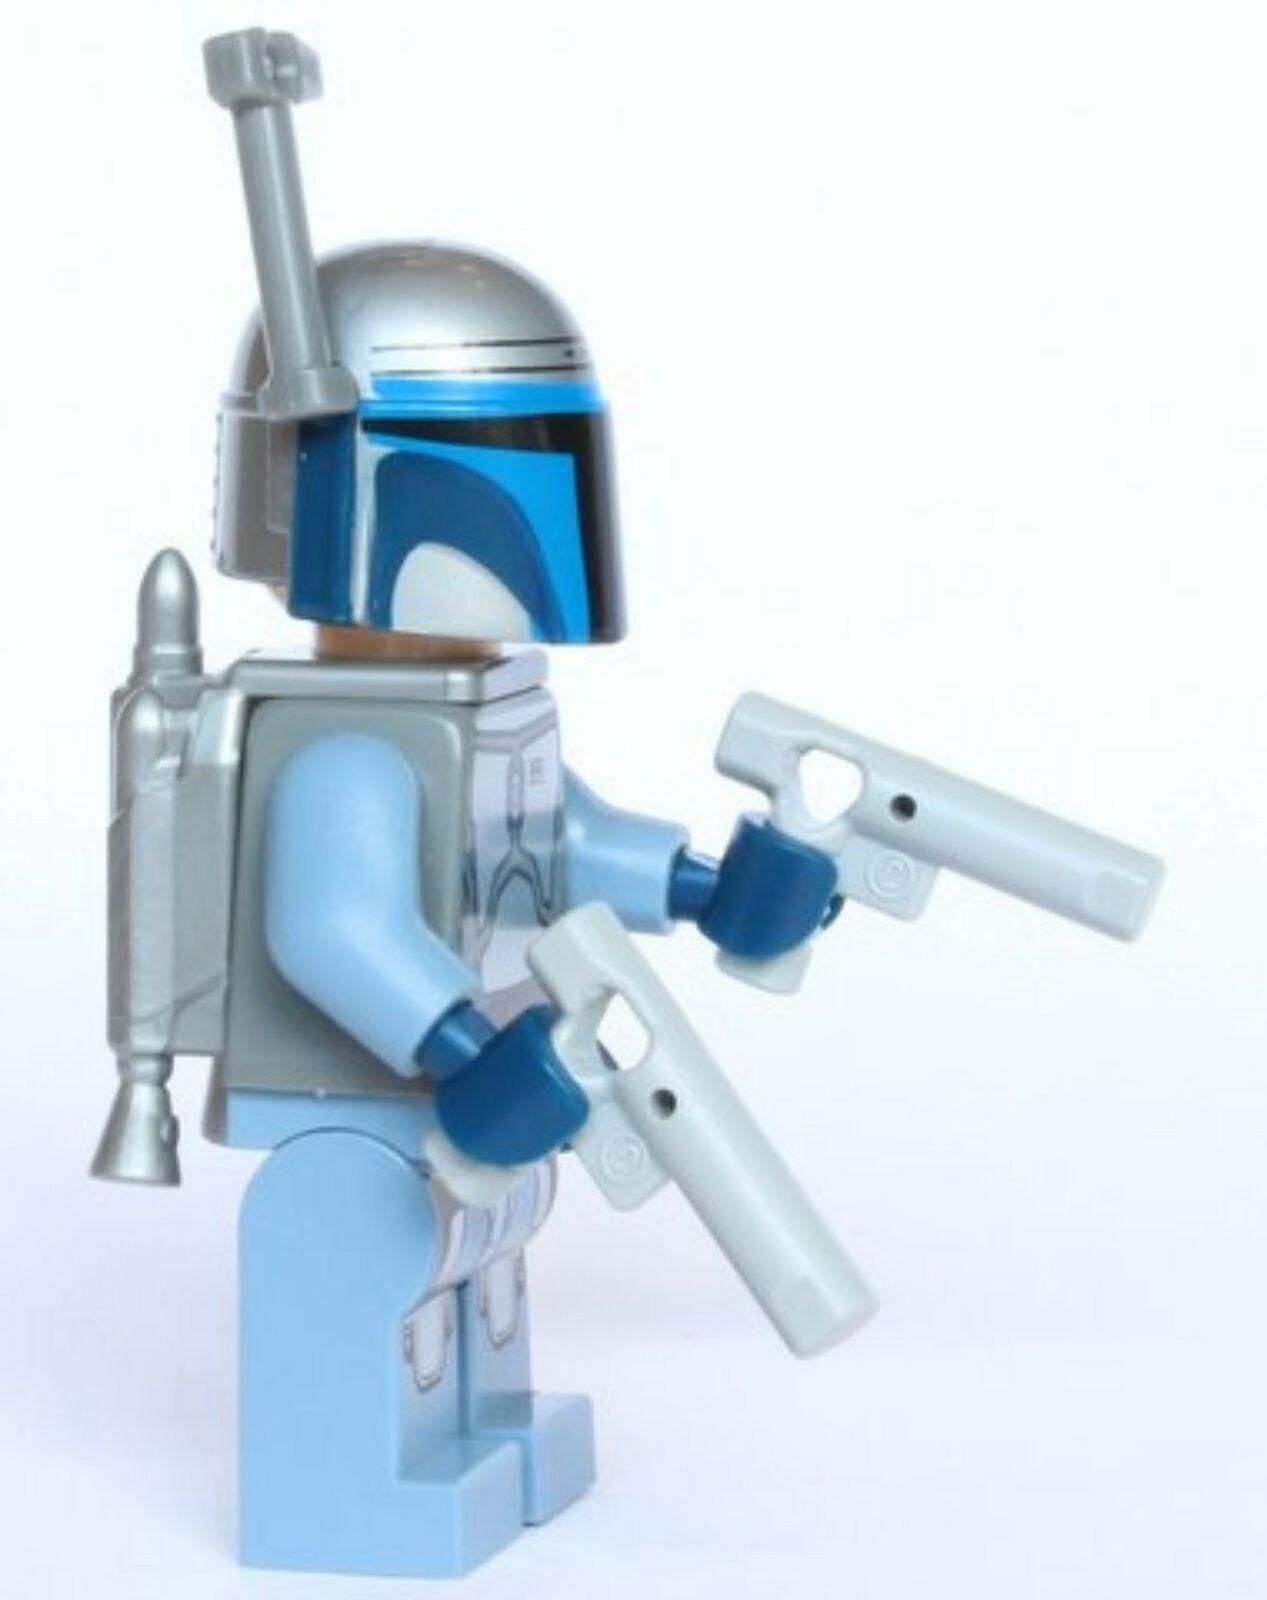 FROM SET 75015  STAR WARS EPISODE 2 Smile NEW LEGO Jango Fett sw0468